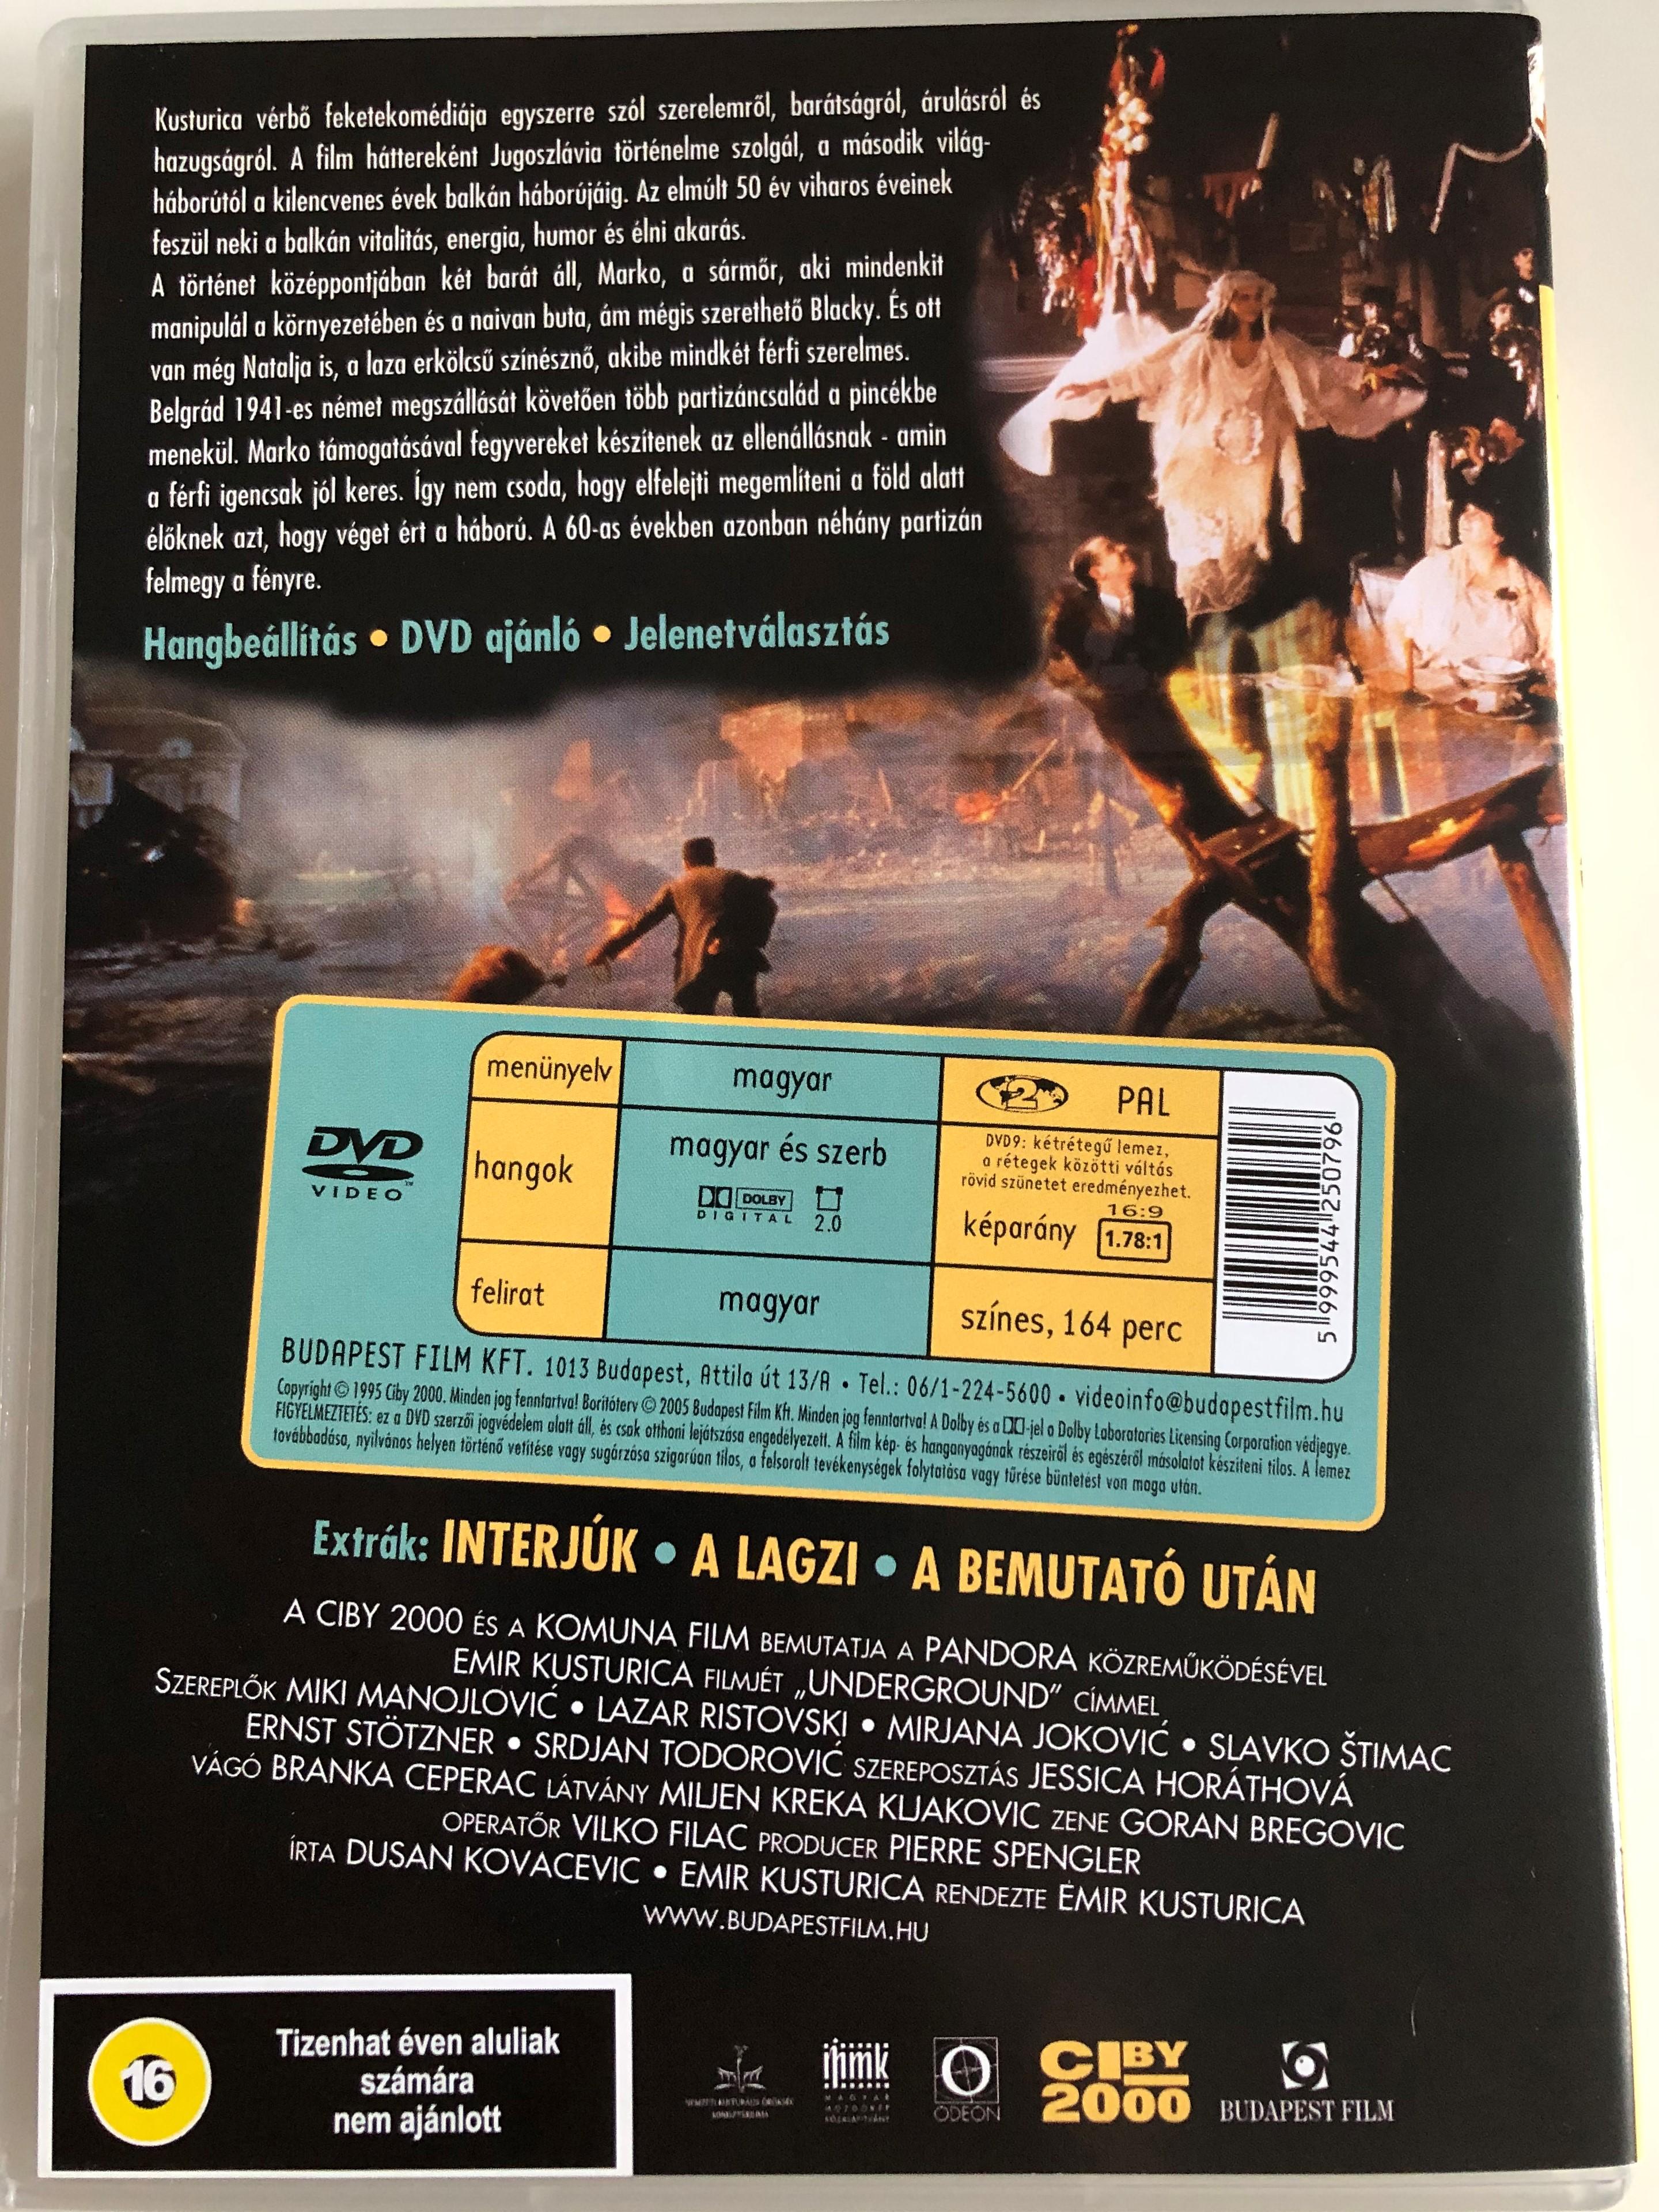 underground-dvd-1995-podzemlje-directed-emir-kusturica-2.jpg